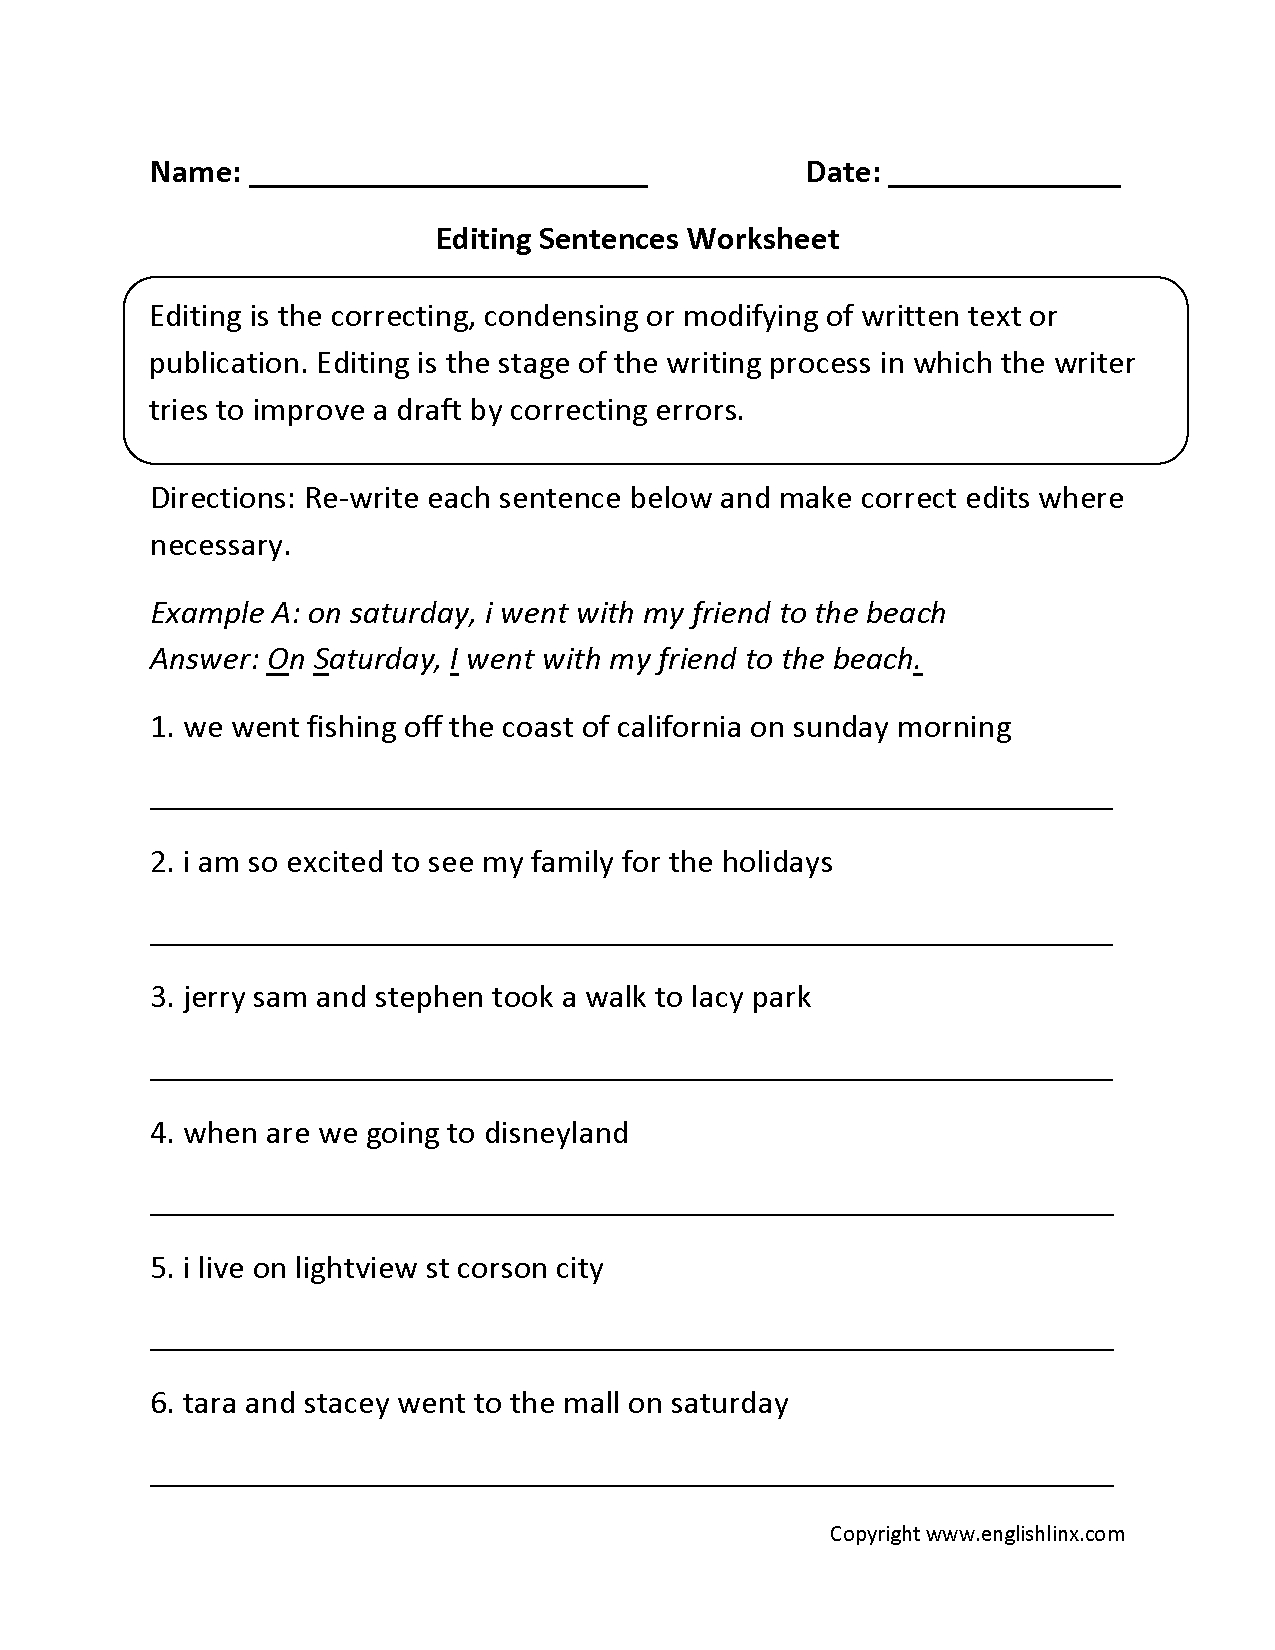 Writing Worksheets | Editing Worksheets | Printable Editing Worksheets